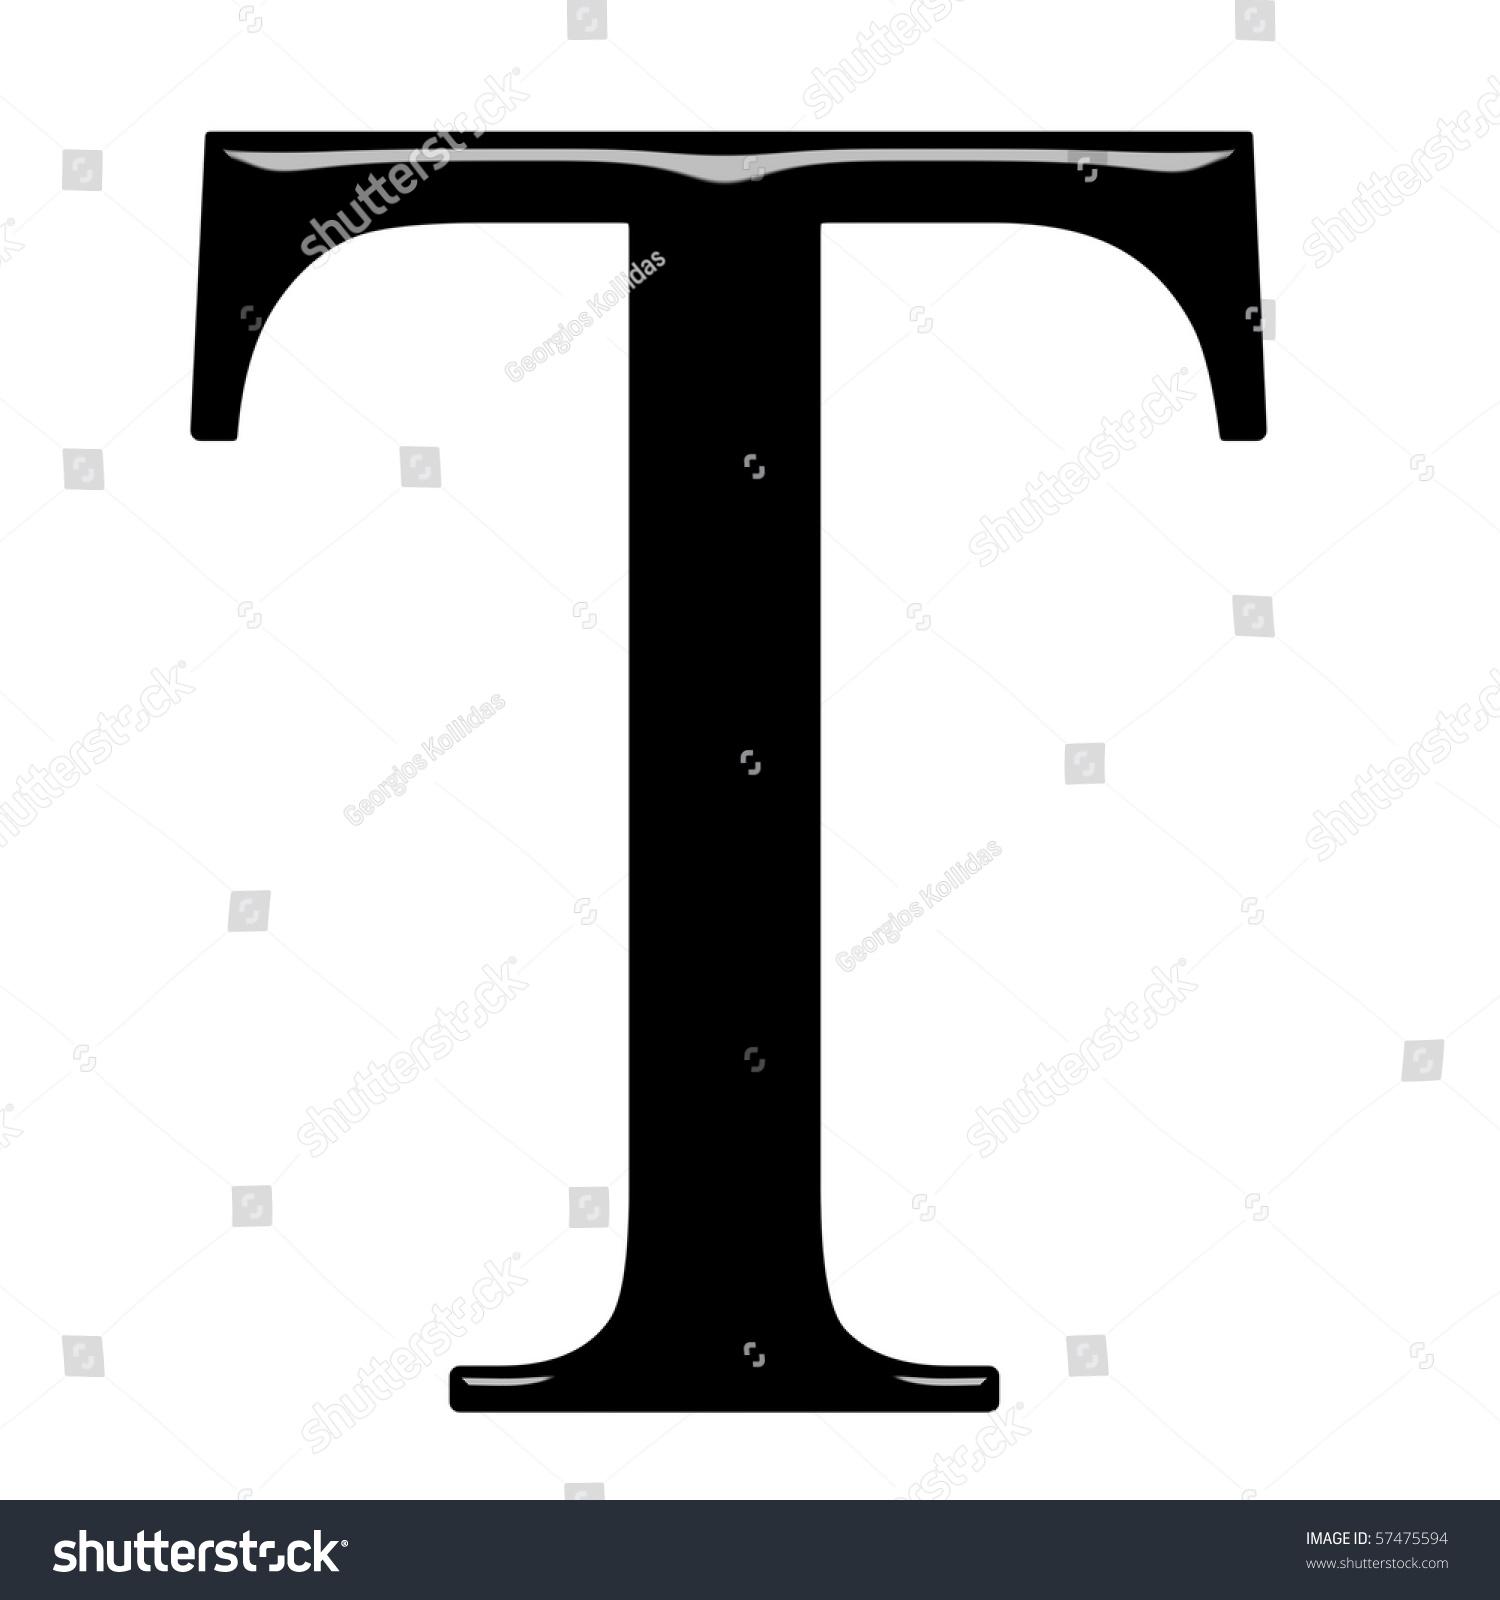 3d Greek letter Tau